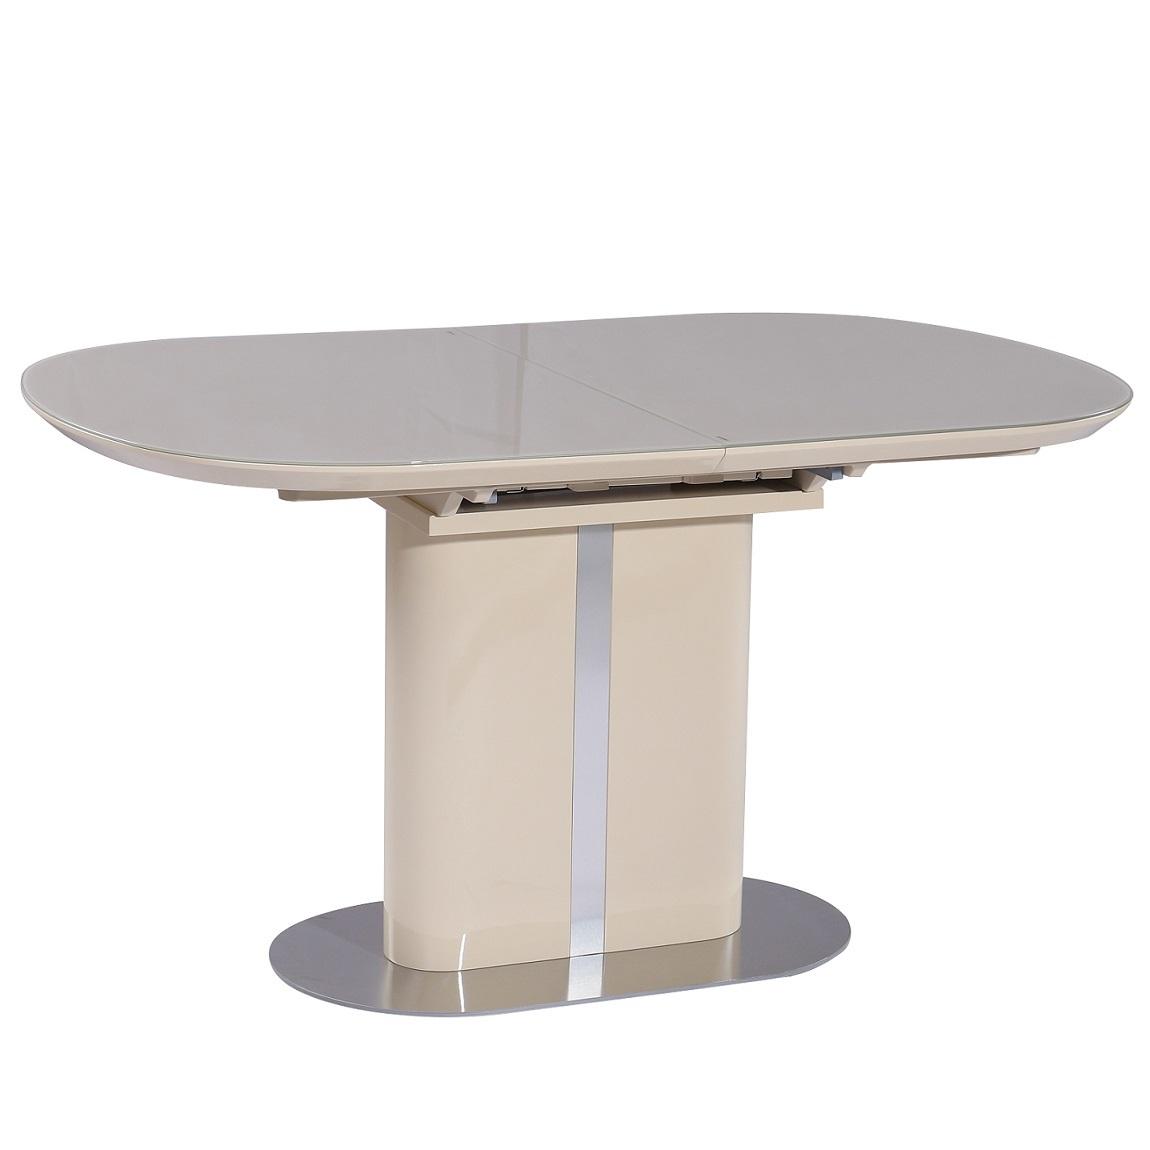 Стол обеденный AVANTI DISCOVERY (140) VANILLA (ваниль)